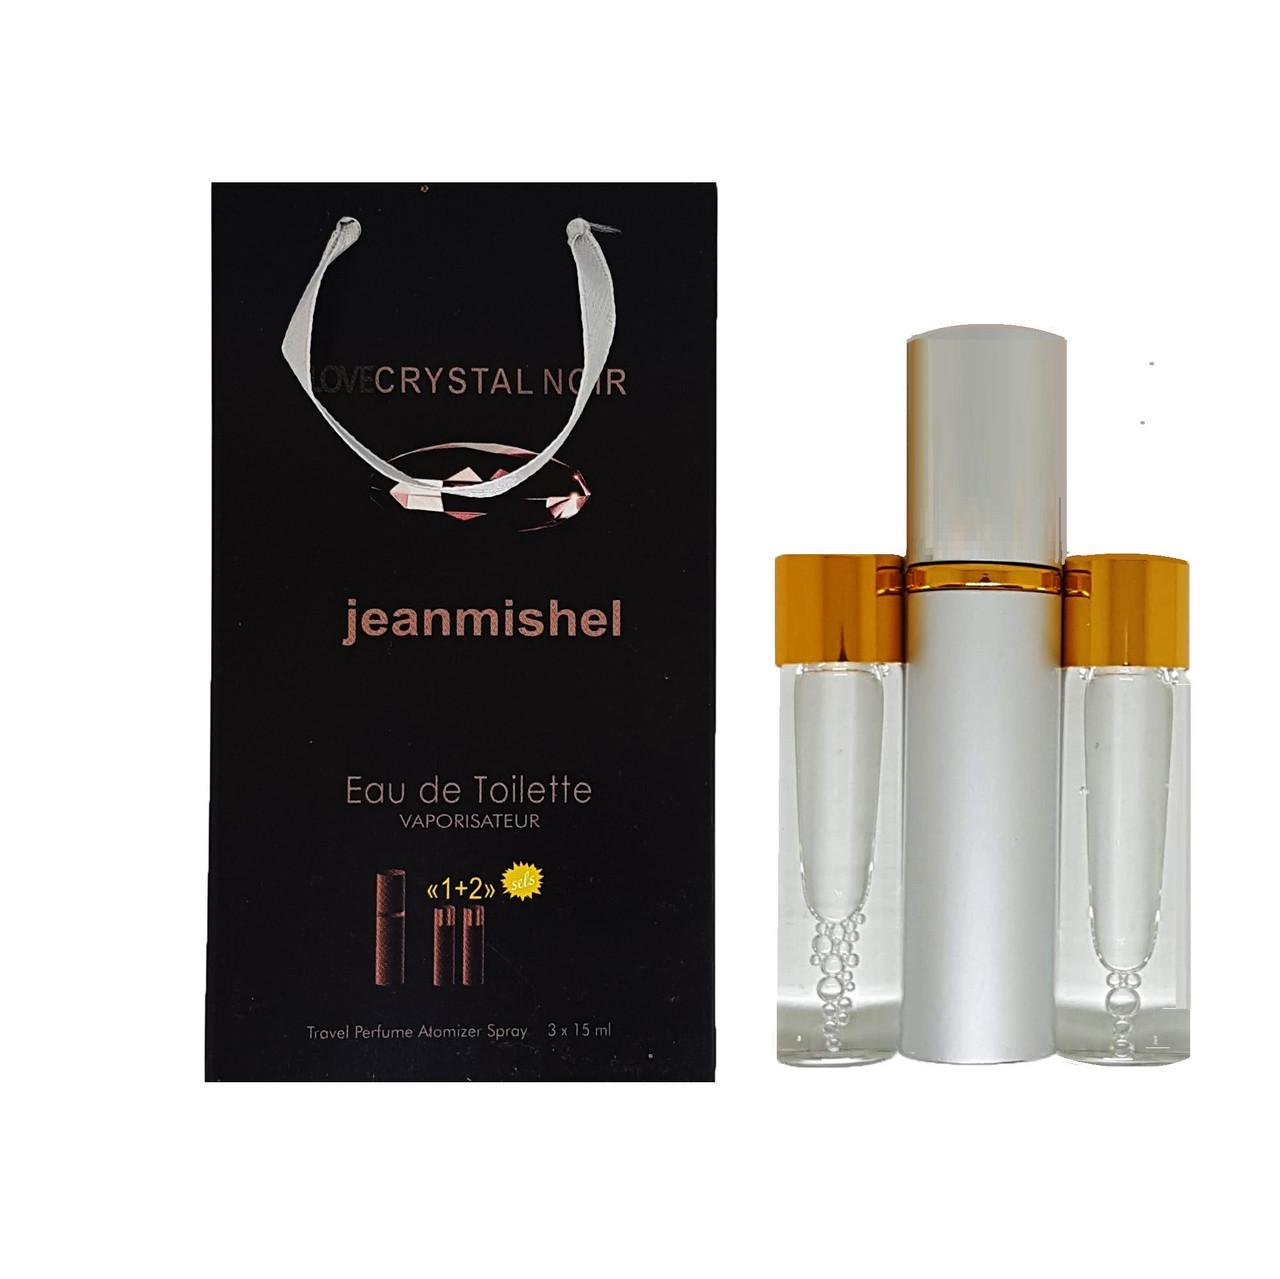 Парфюм-спрей Jeanmishel Love Crystal Noir (72) 3 x 15 мл